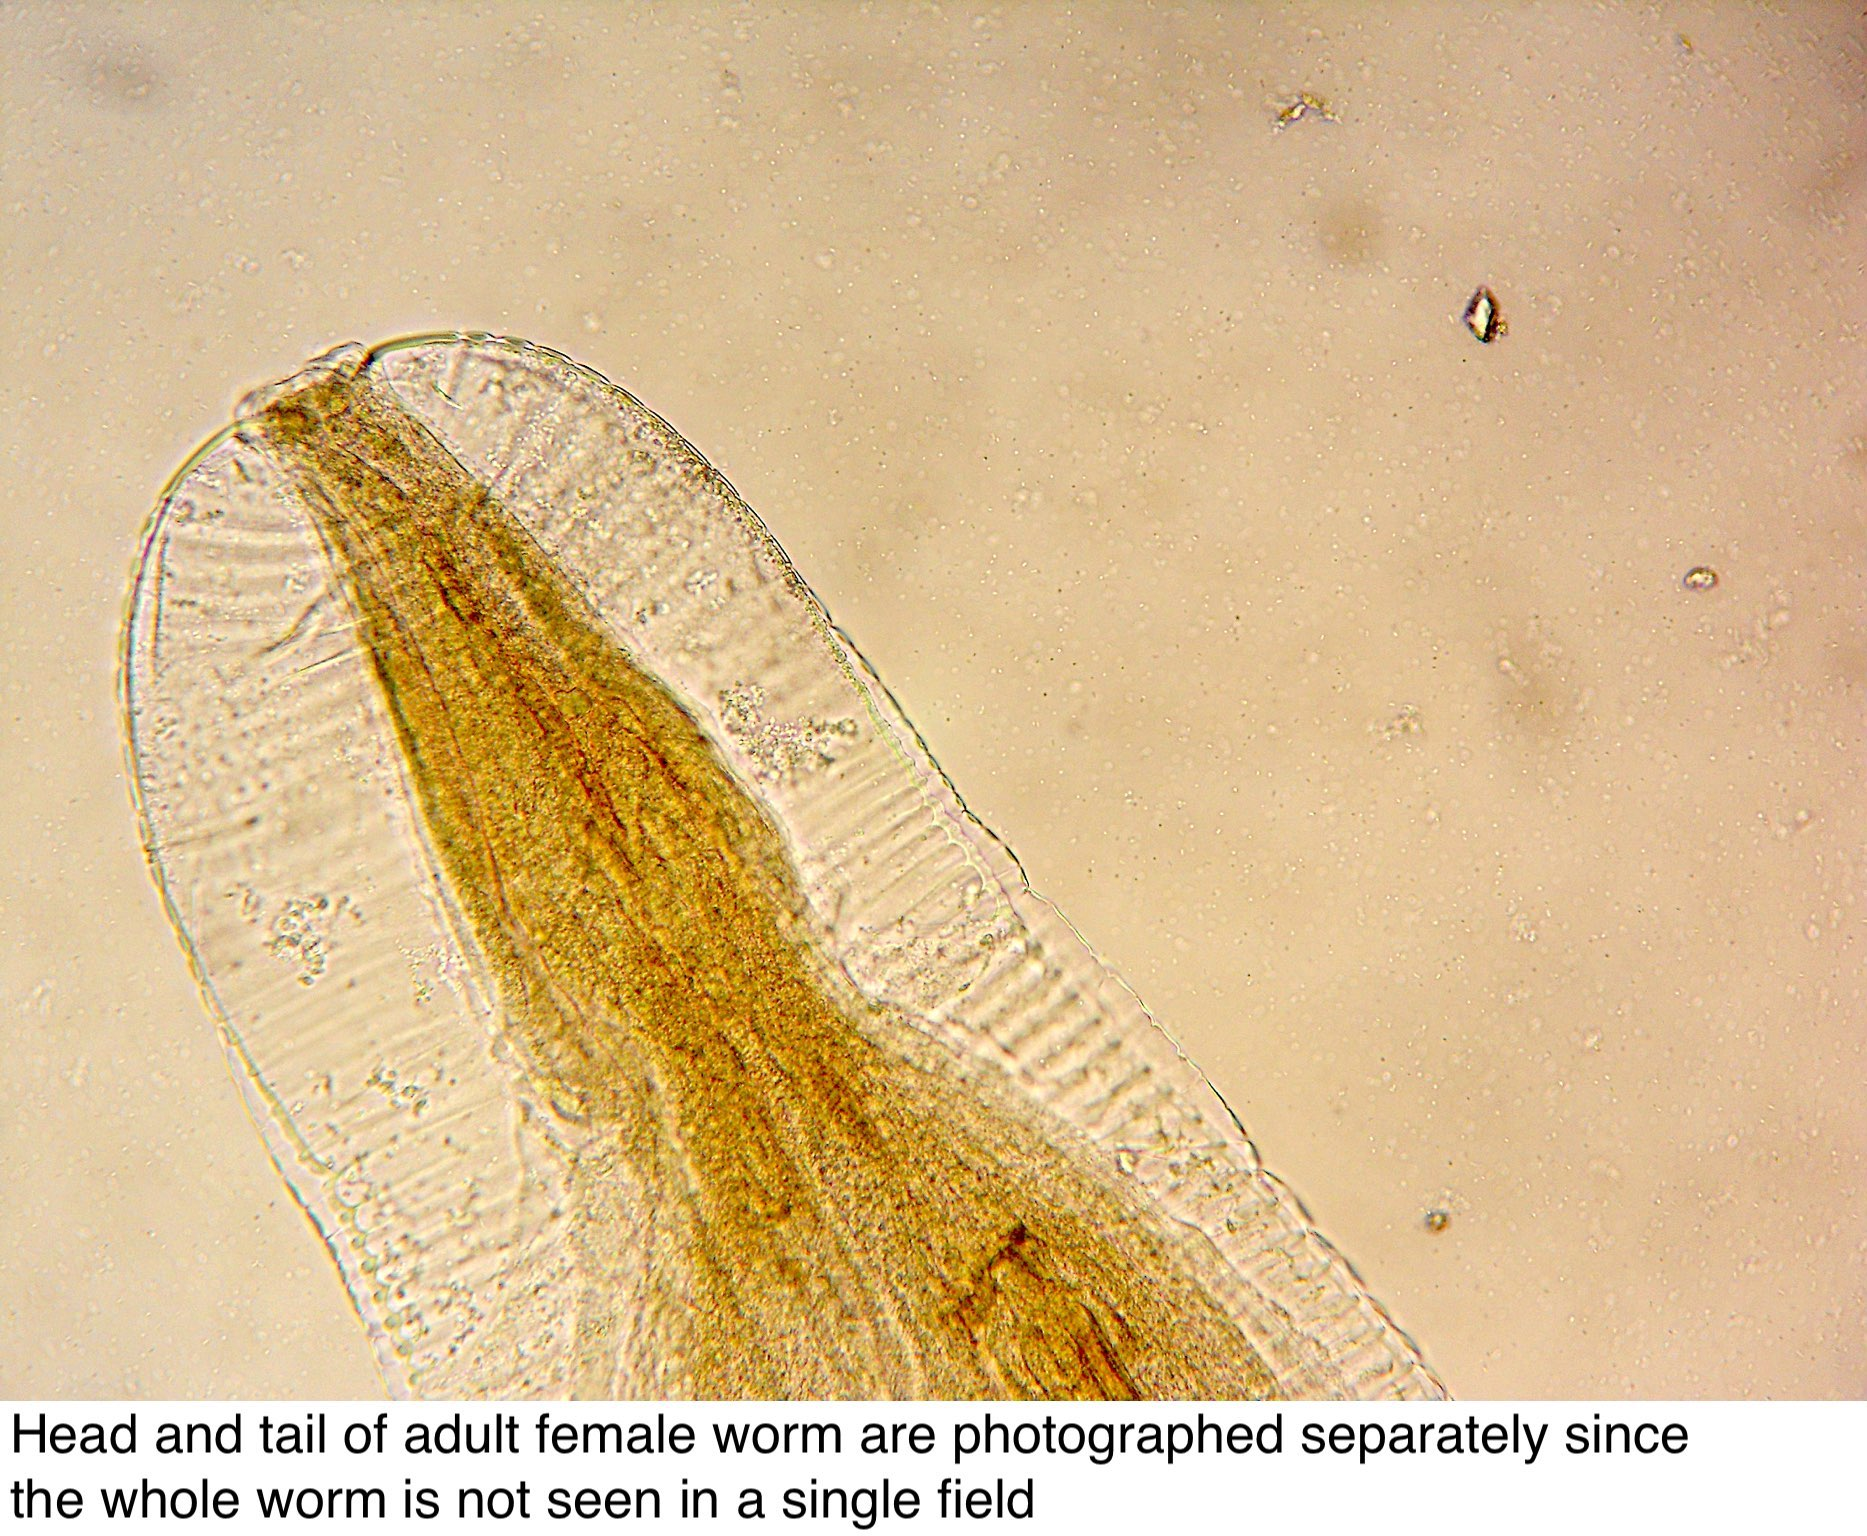 enterobius vermicularis vagy oxyure)